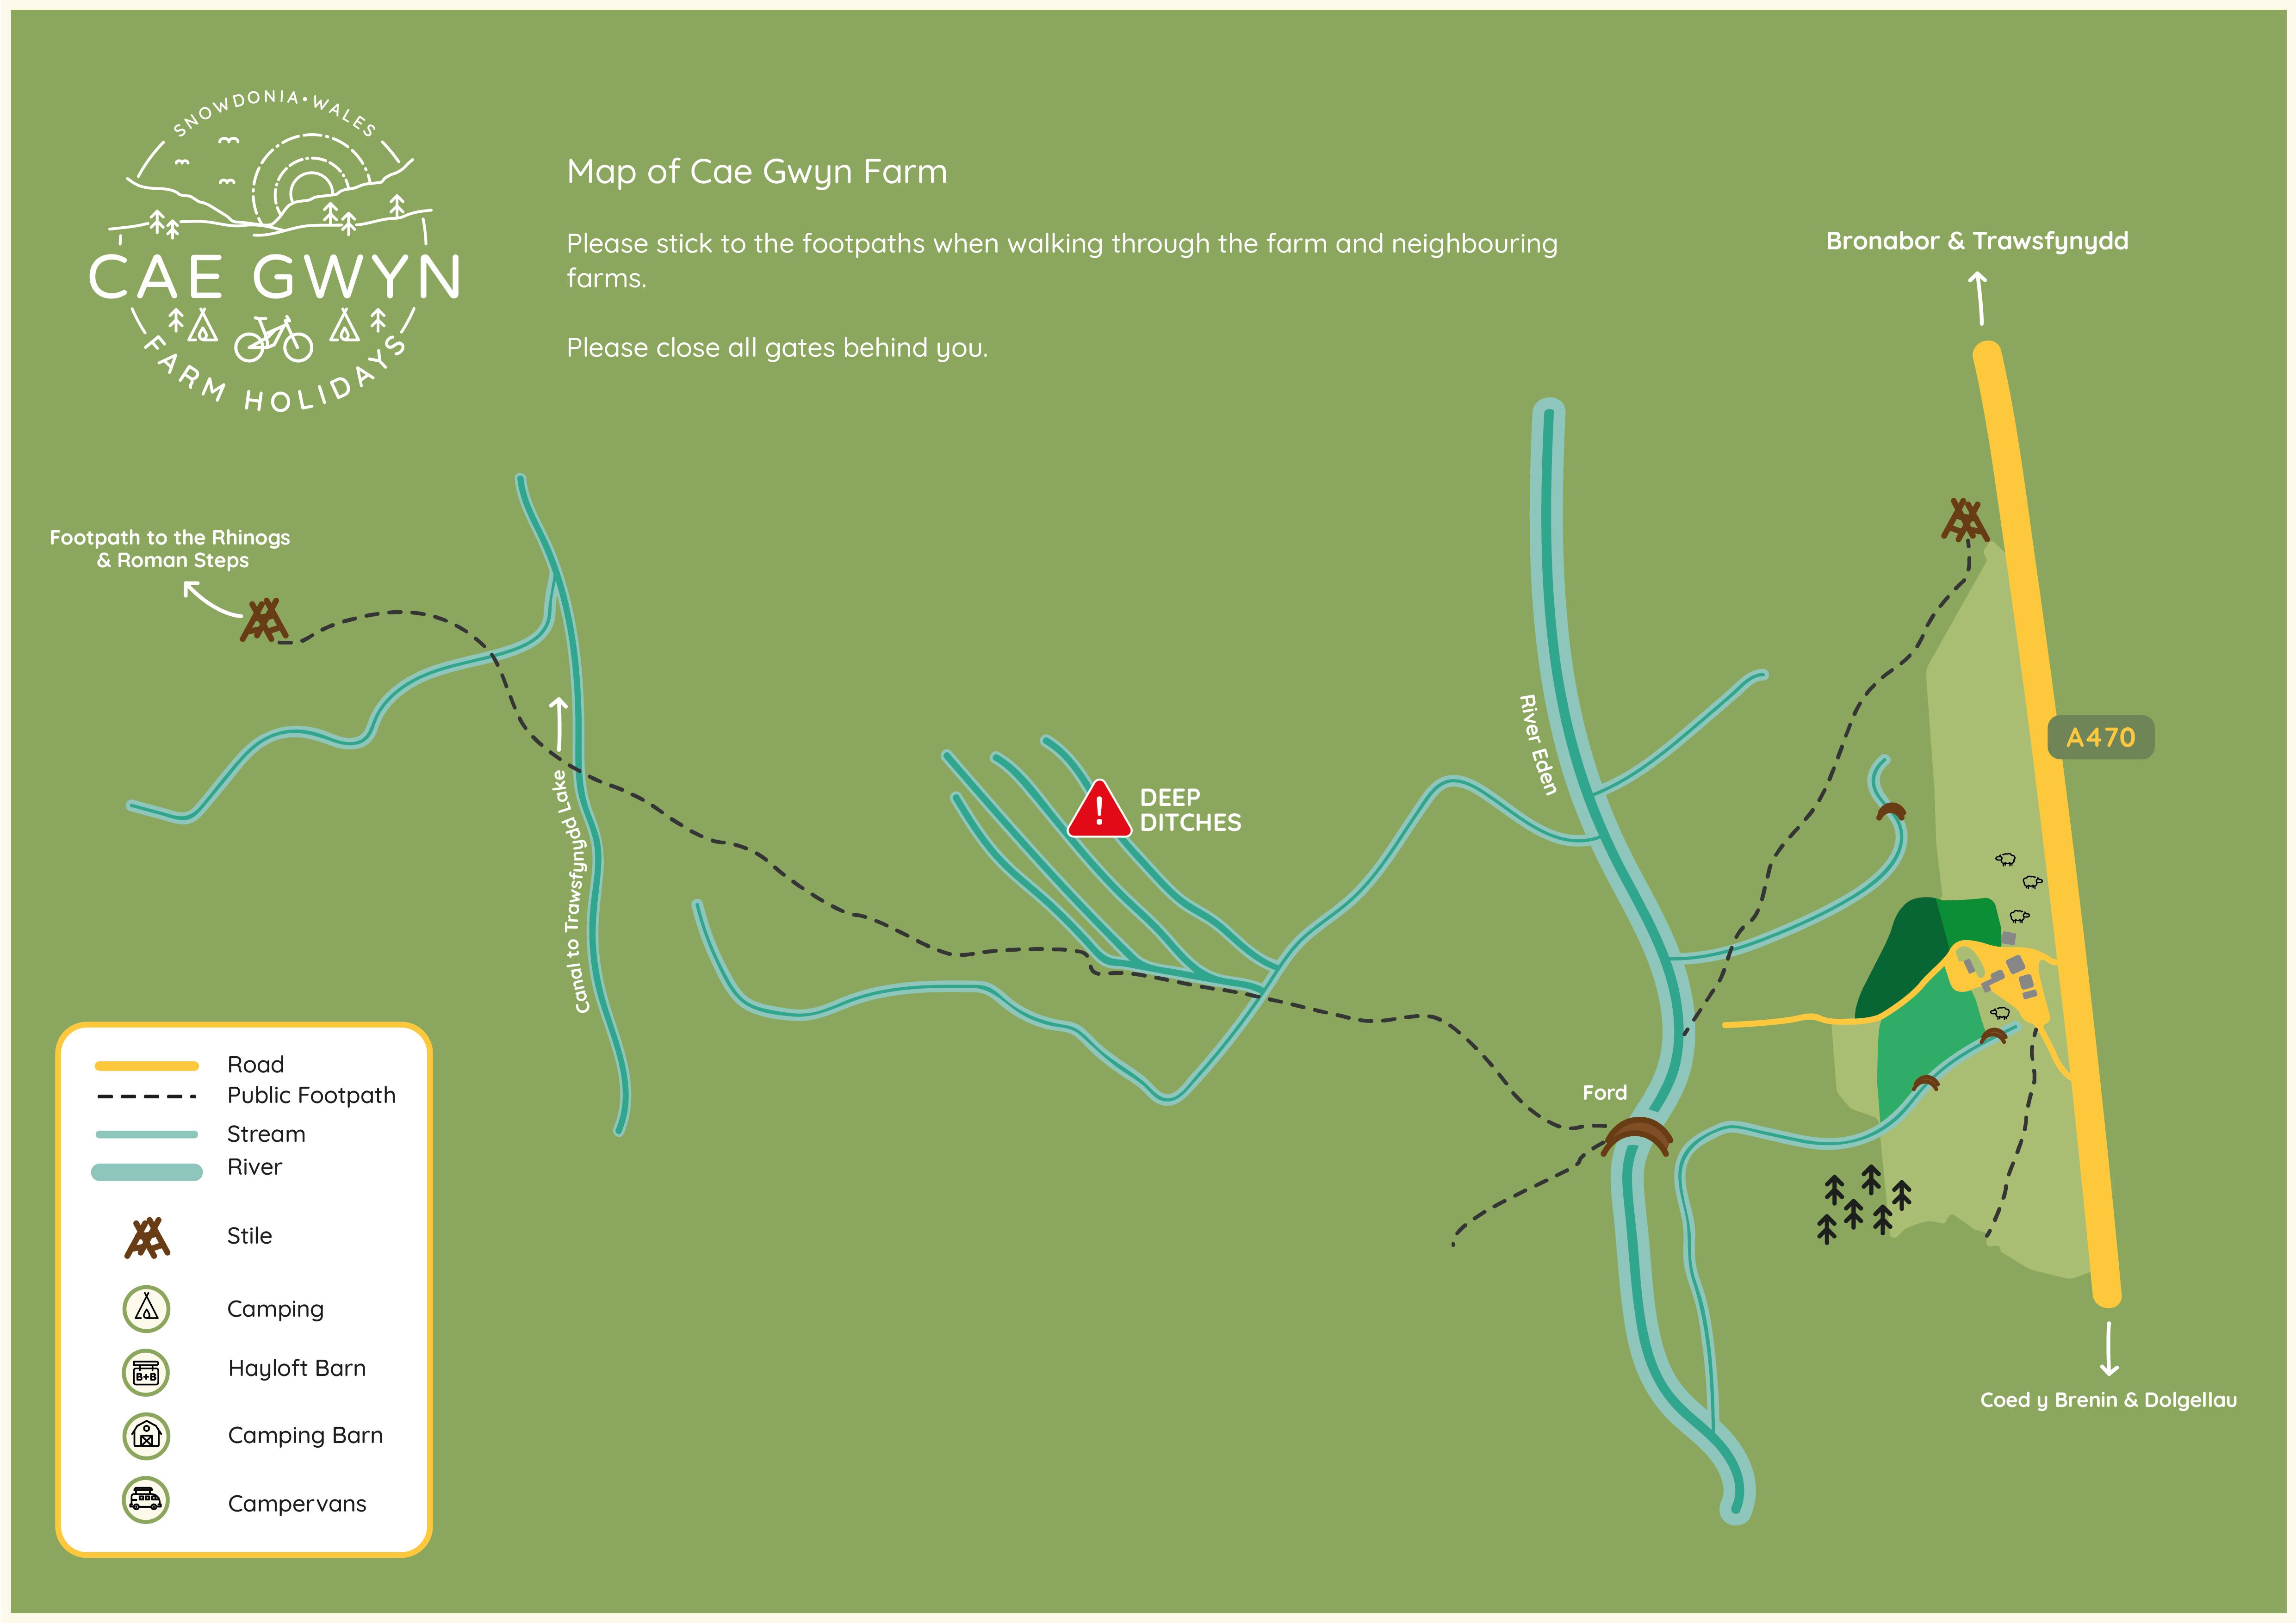 Map of surrounding area to Cae Gwyn